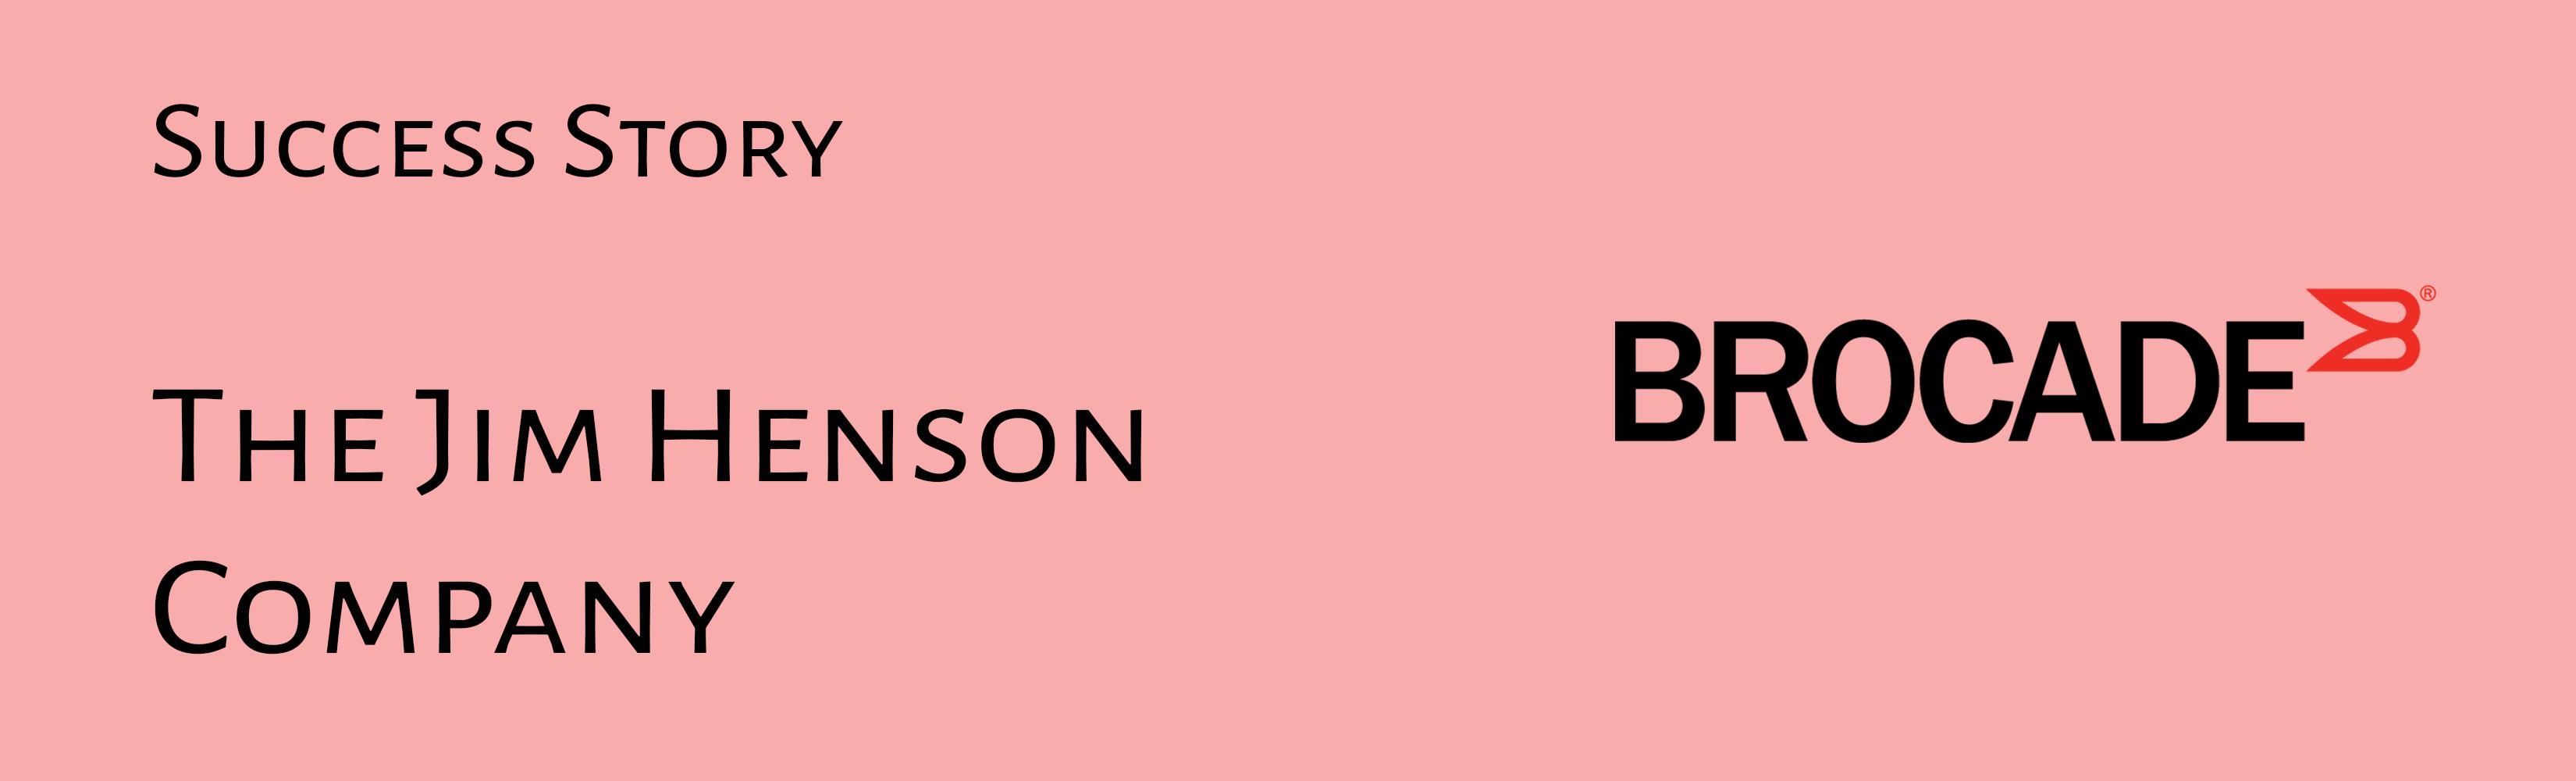 BROCADE_Success Story_Jim Henson Company